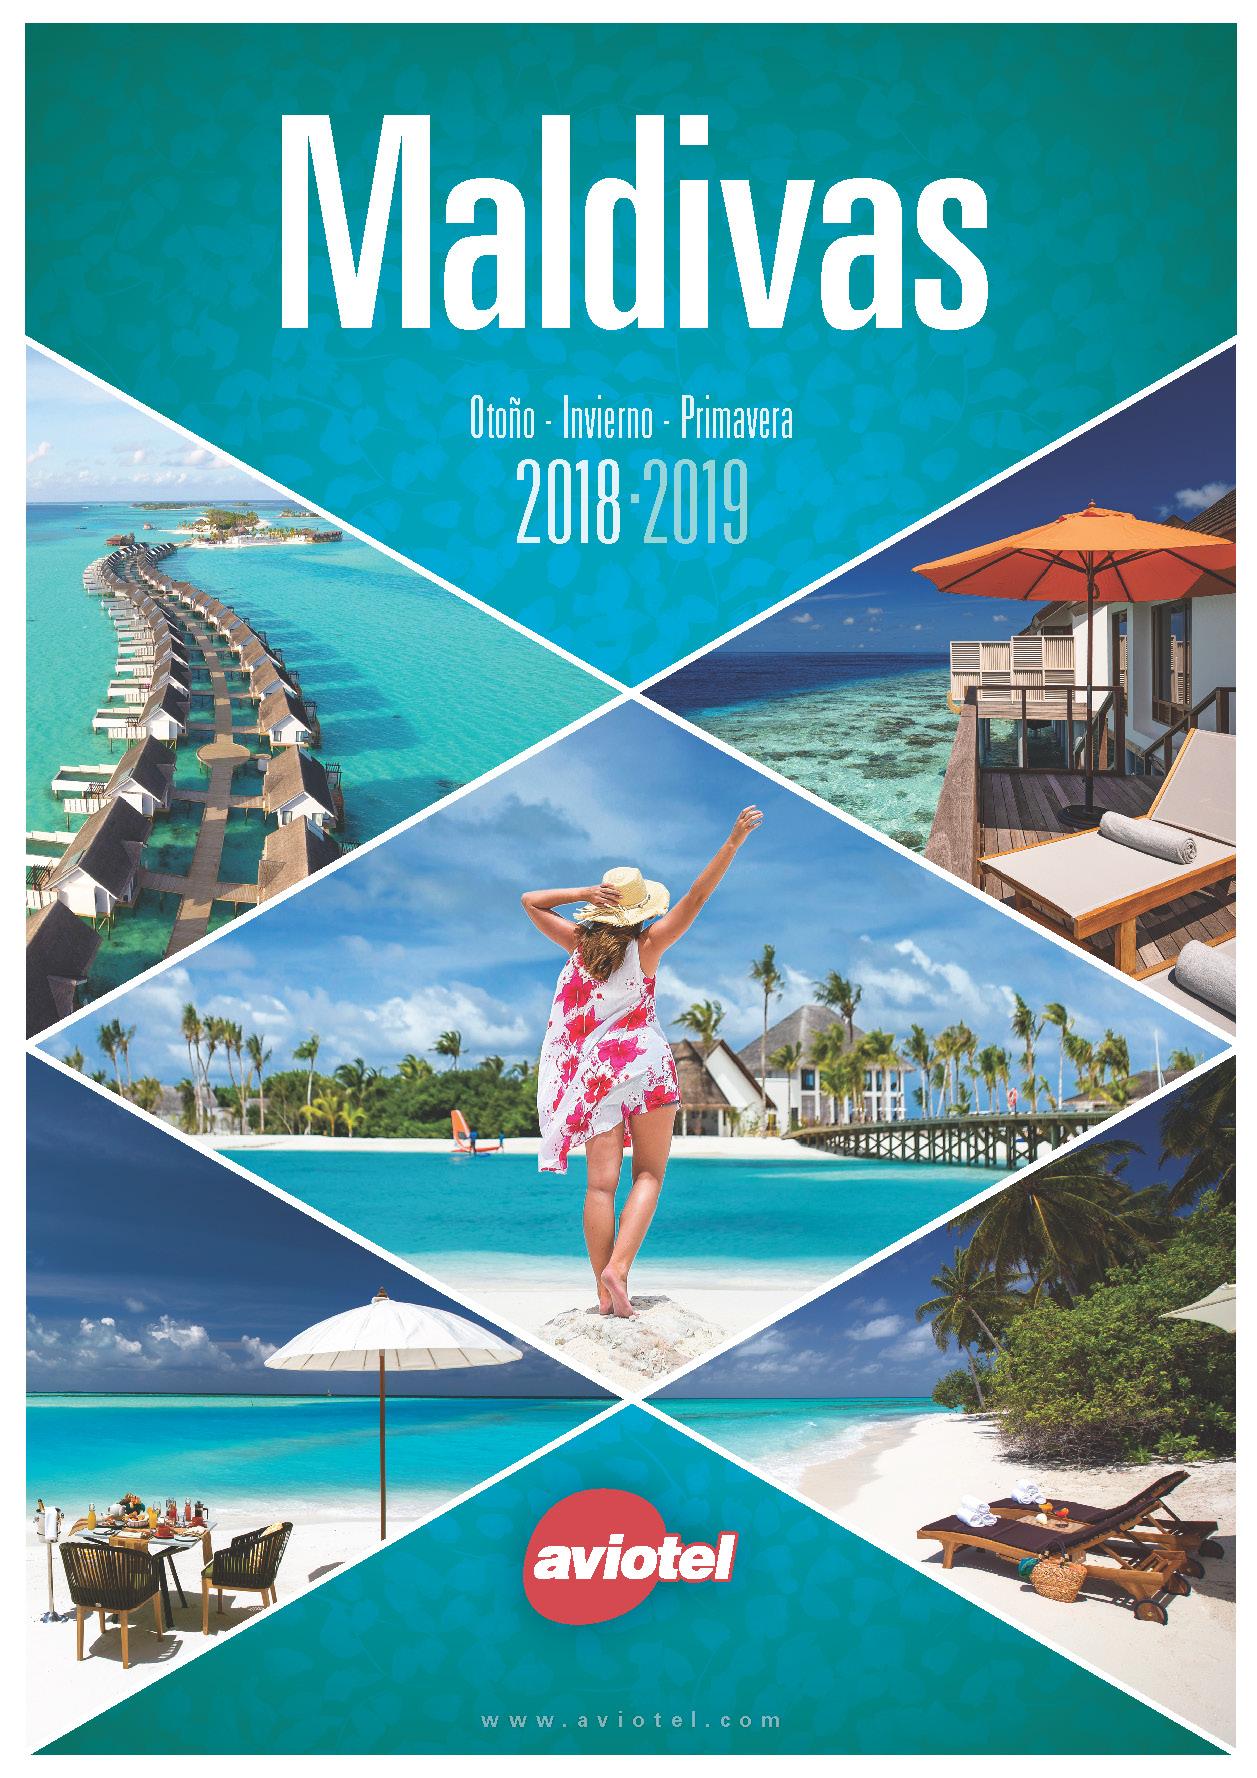 Catalogo Aviotel Maldivas Otono-Invierno-Primavera 2018-2019